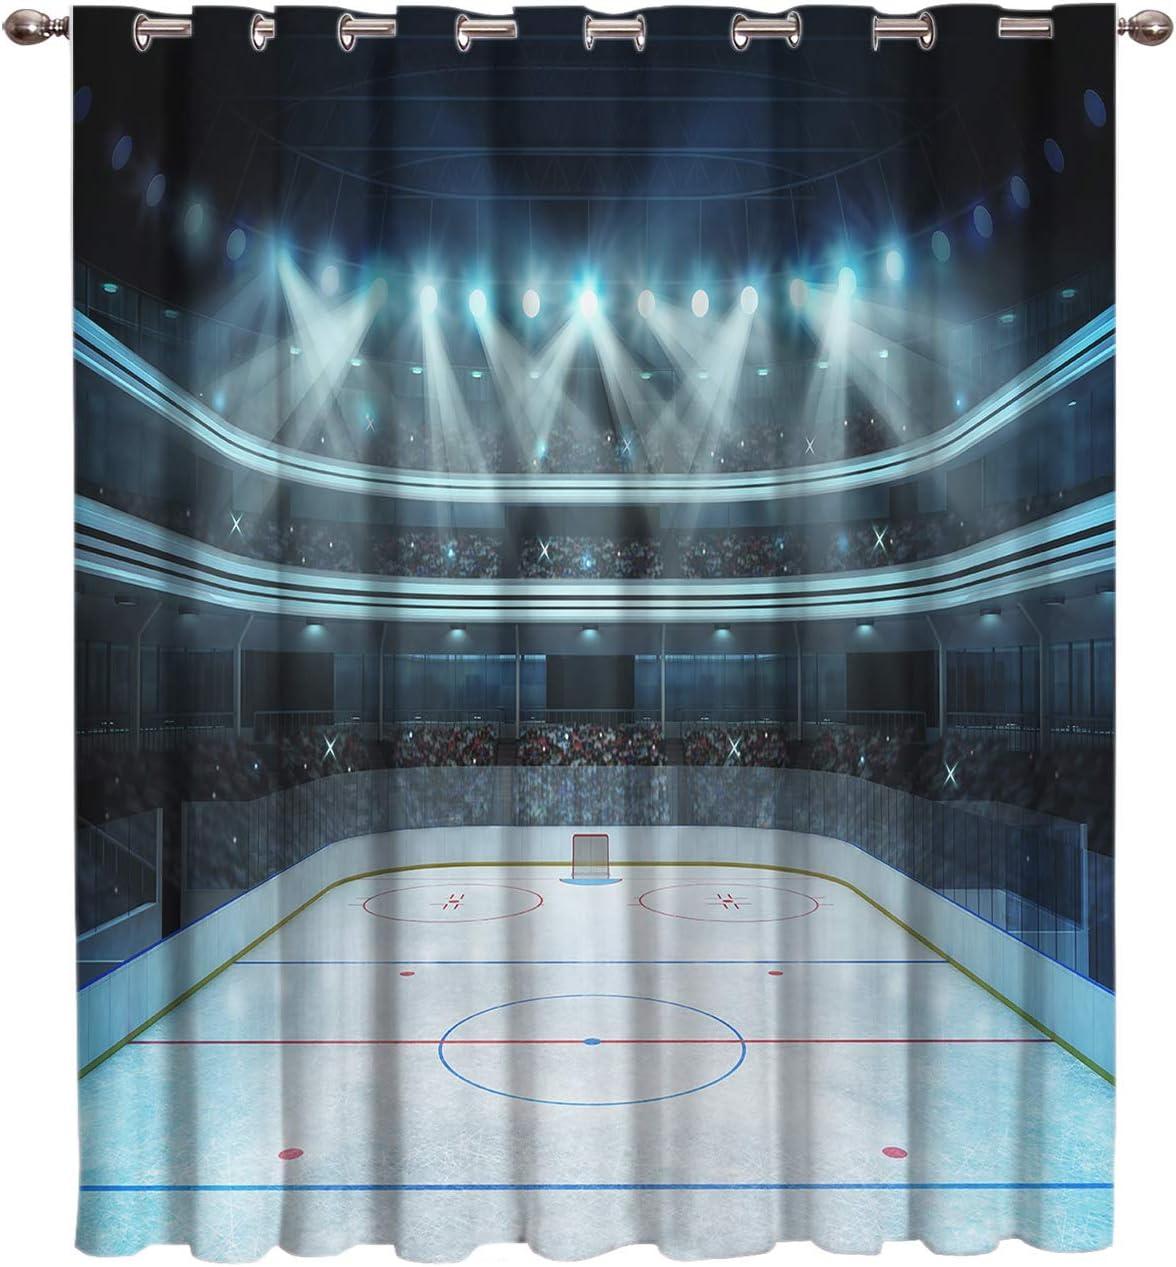 Arts Language Blackout Curtains Grommet Drapes for Boys Girls Kids Bedroom Hockey Area Spotlight Audience Printed Room Darkening Curtains Grommet for Livingroom Office, 1 Panel 52x96in